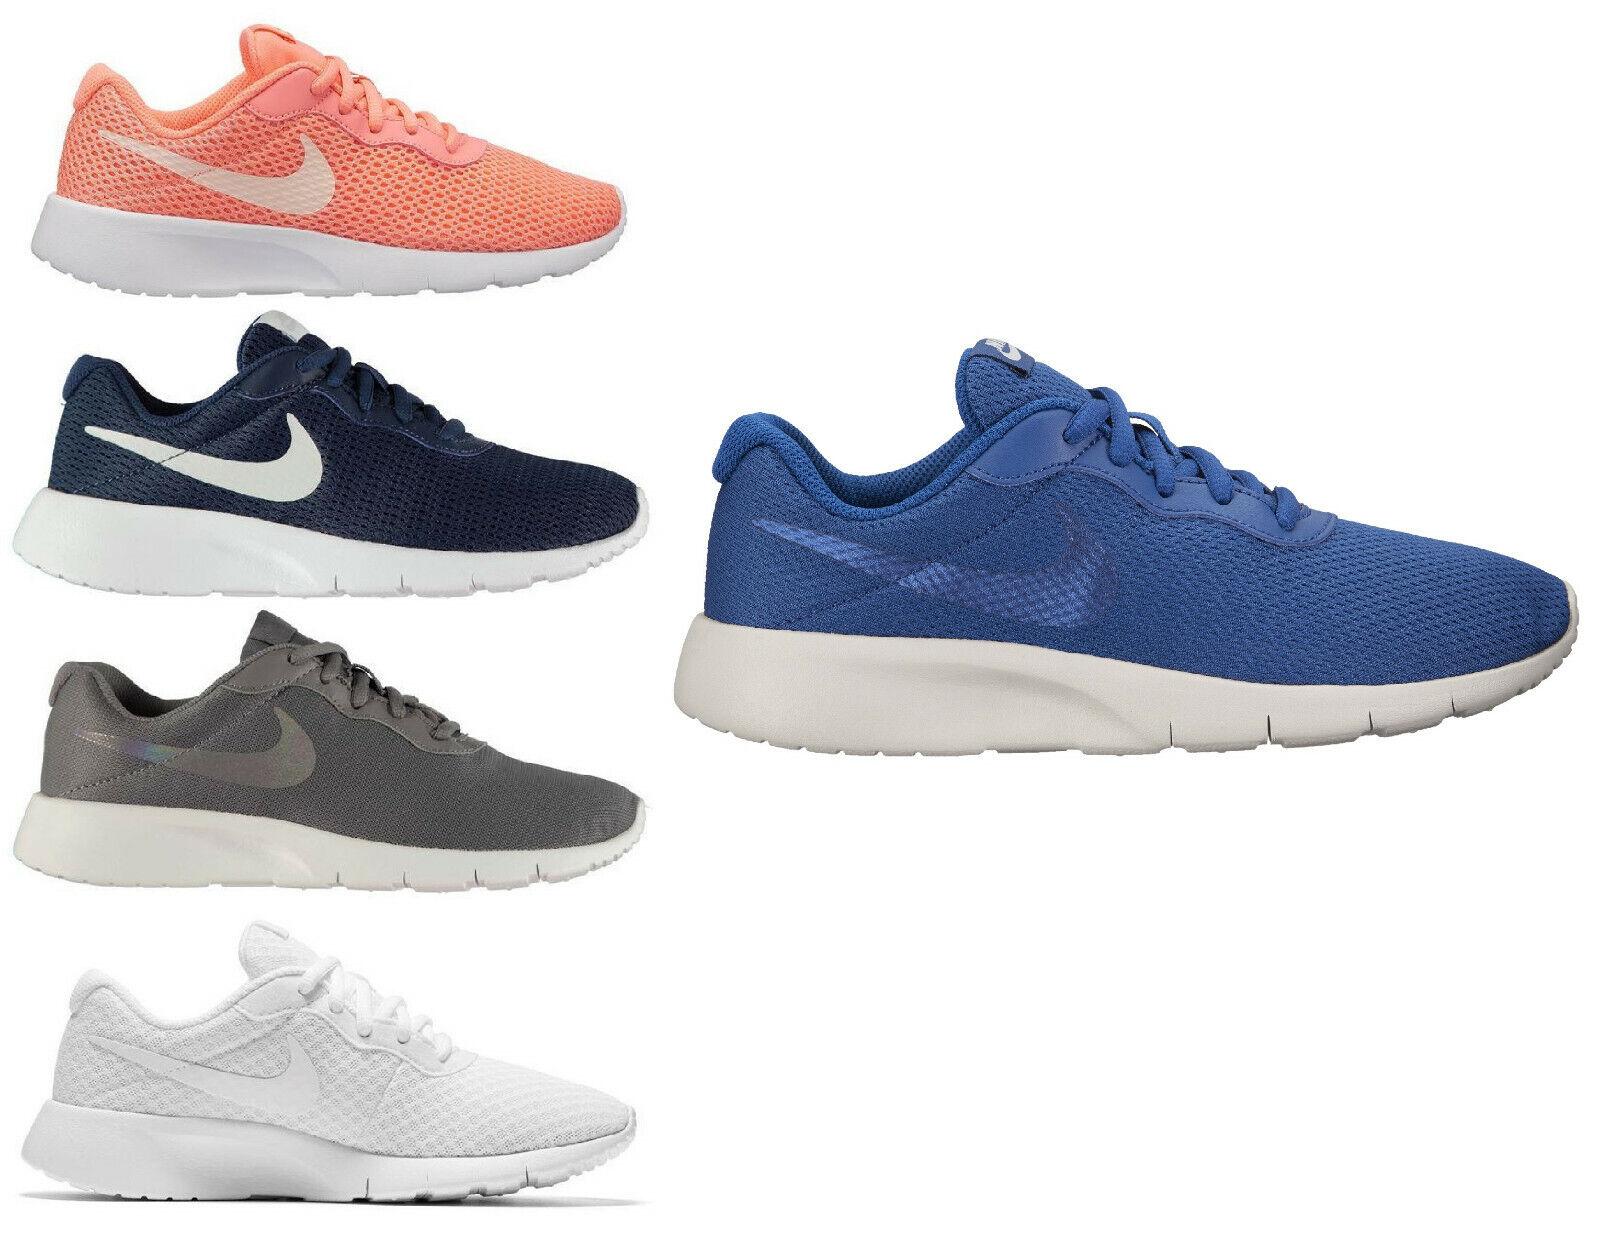 Nike De Mujer Running Running Running Zapatillas NIKE Tanjun Damas Niñas Deportes Entrenamiento Gimnasio Zapatos  la red entera más baja